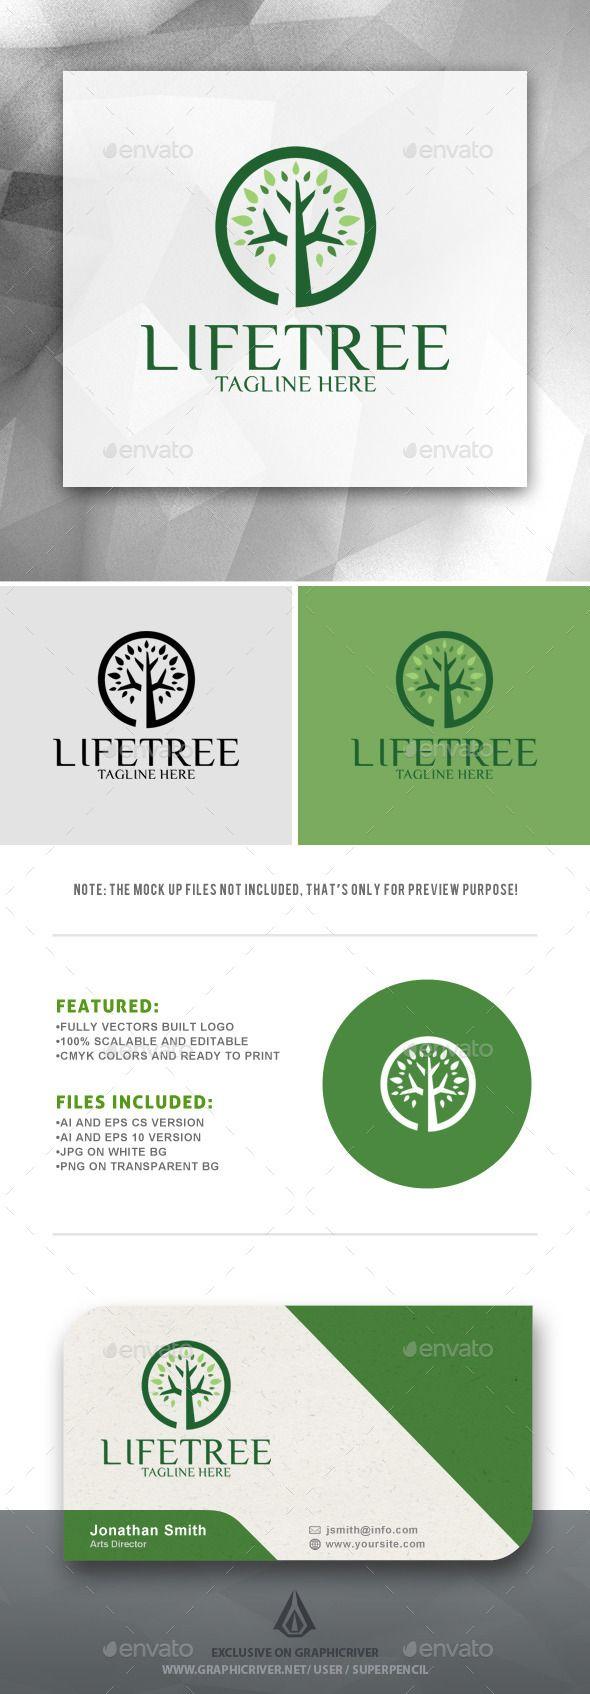 Life Tree Logo (JPG Image, Vector EPS, AI Illustrator, Resizable, CS, app, center, circle tree, eco, ecology logo, environment, food, forest, fund, garden, green, grow, health, leaf, life, live, nature, organic, outdoors, outside, park, plant, power, sharp, smart, spa, tree, wood)